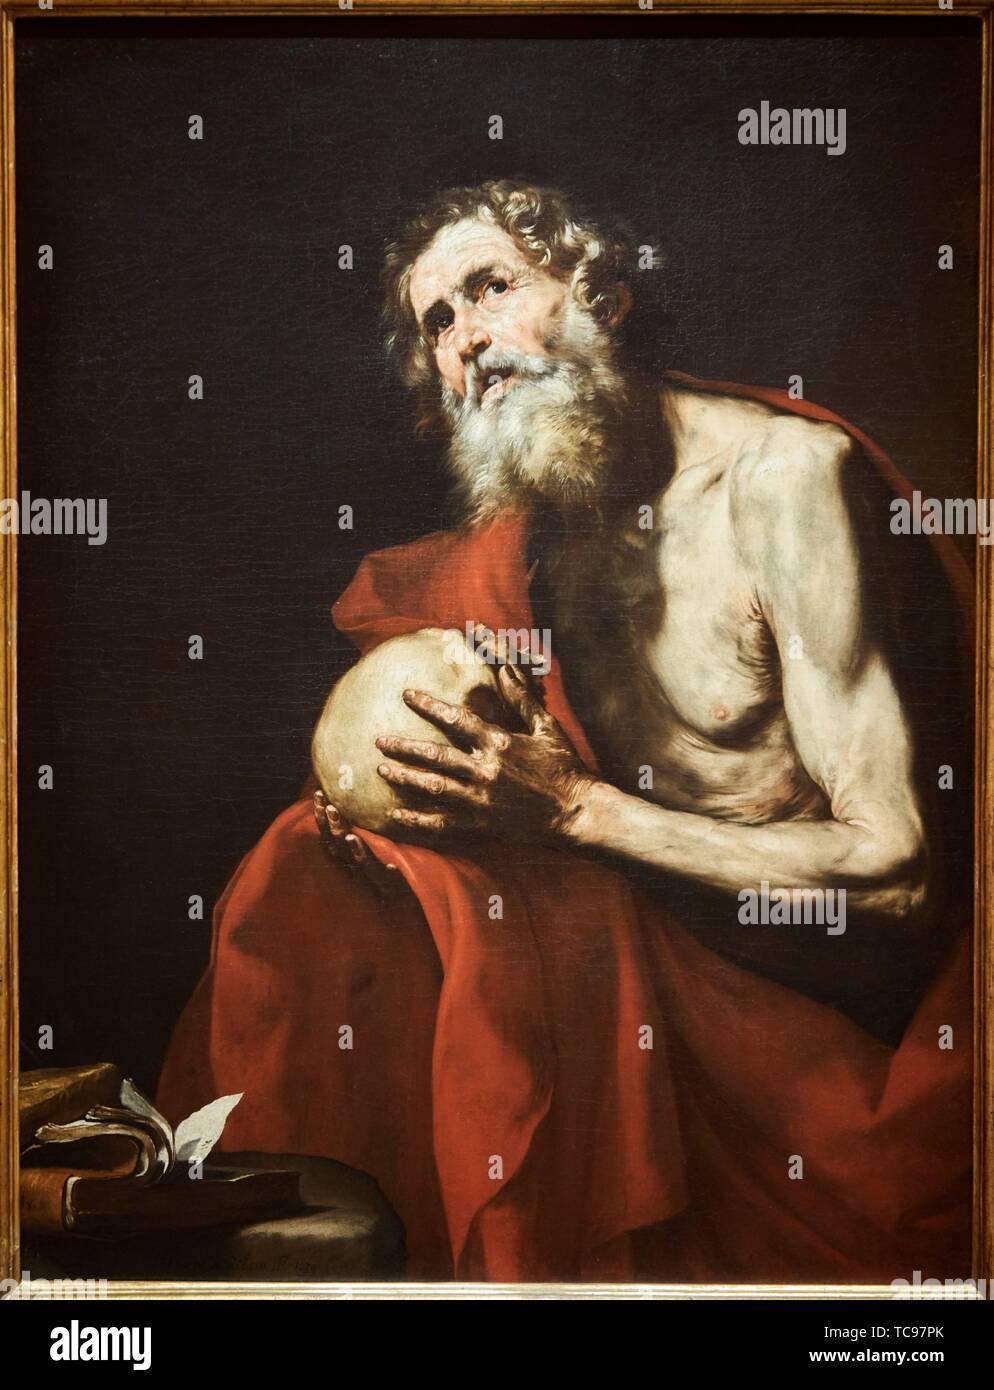 '''Saint Jerome in Penitence'', 1634, José de Ribera, Thyssen Bornemisza Museum, Madrid, Spain, Europe - Stock Image